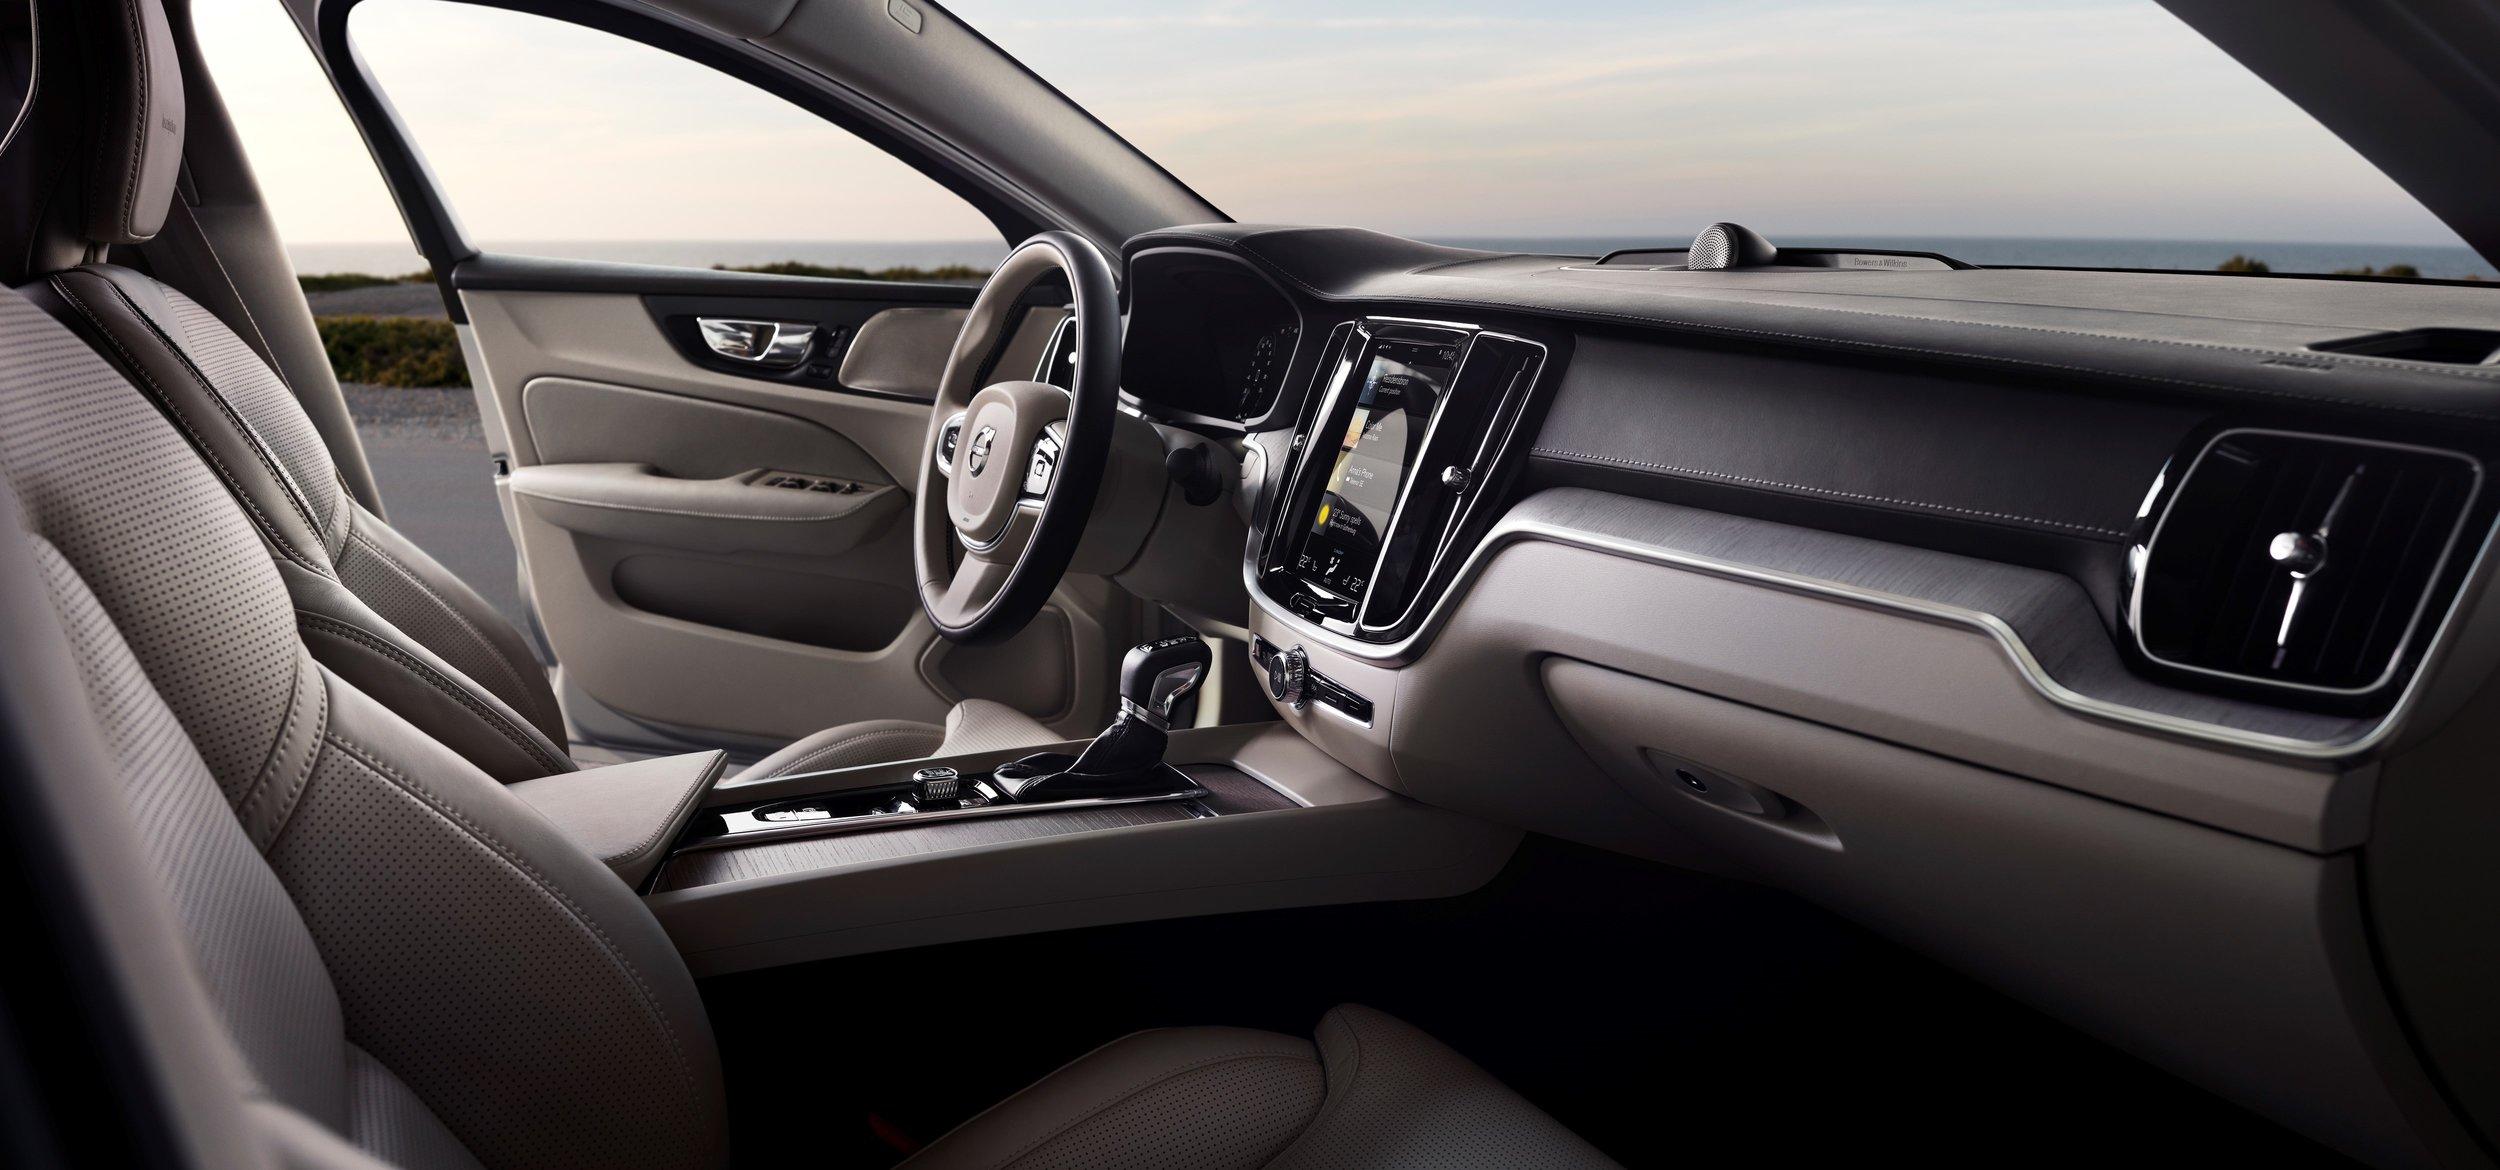 Volvo_S60.jpg